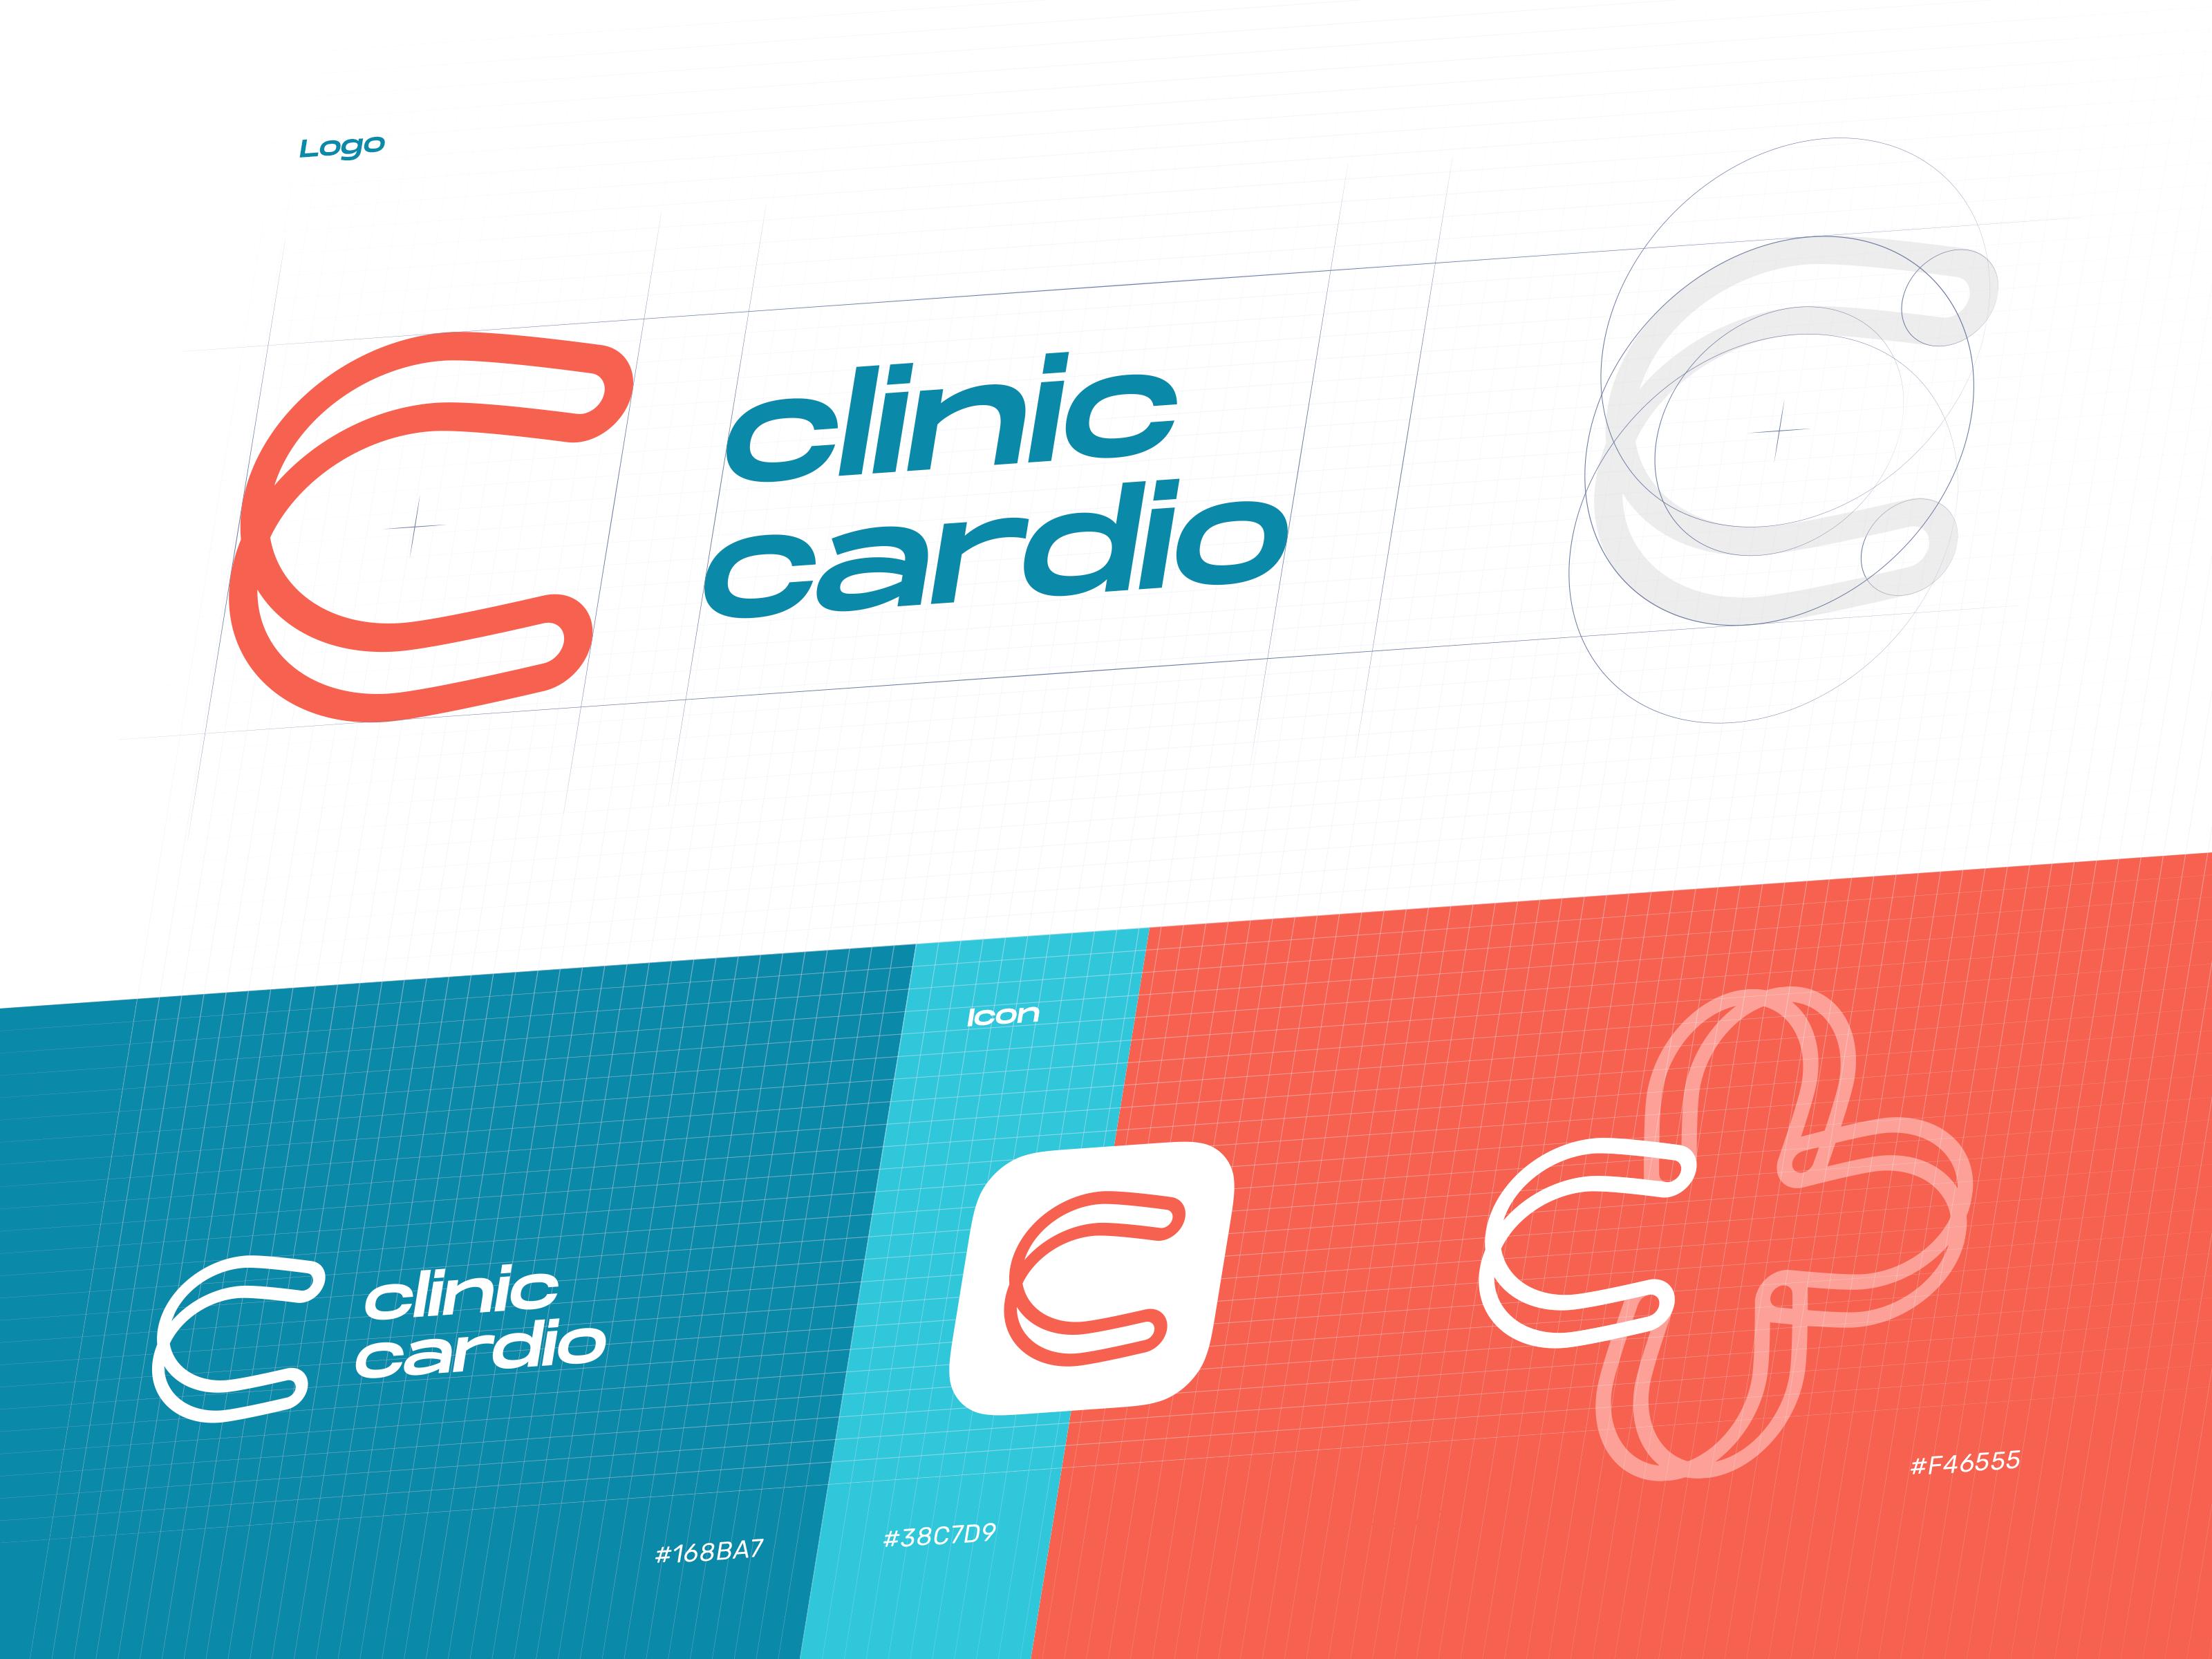 cardio health service_logo_design_tubik